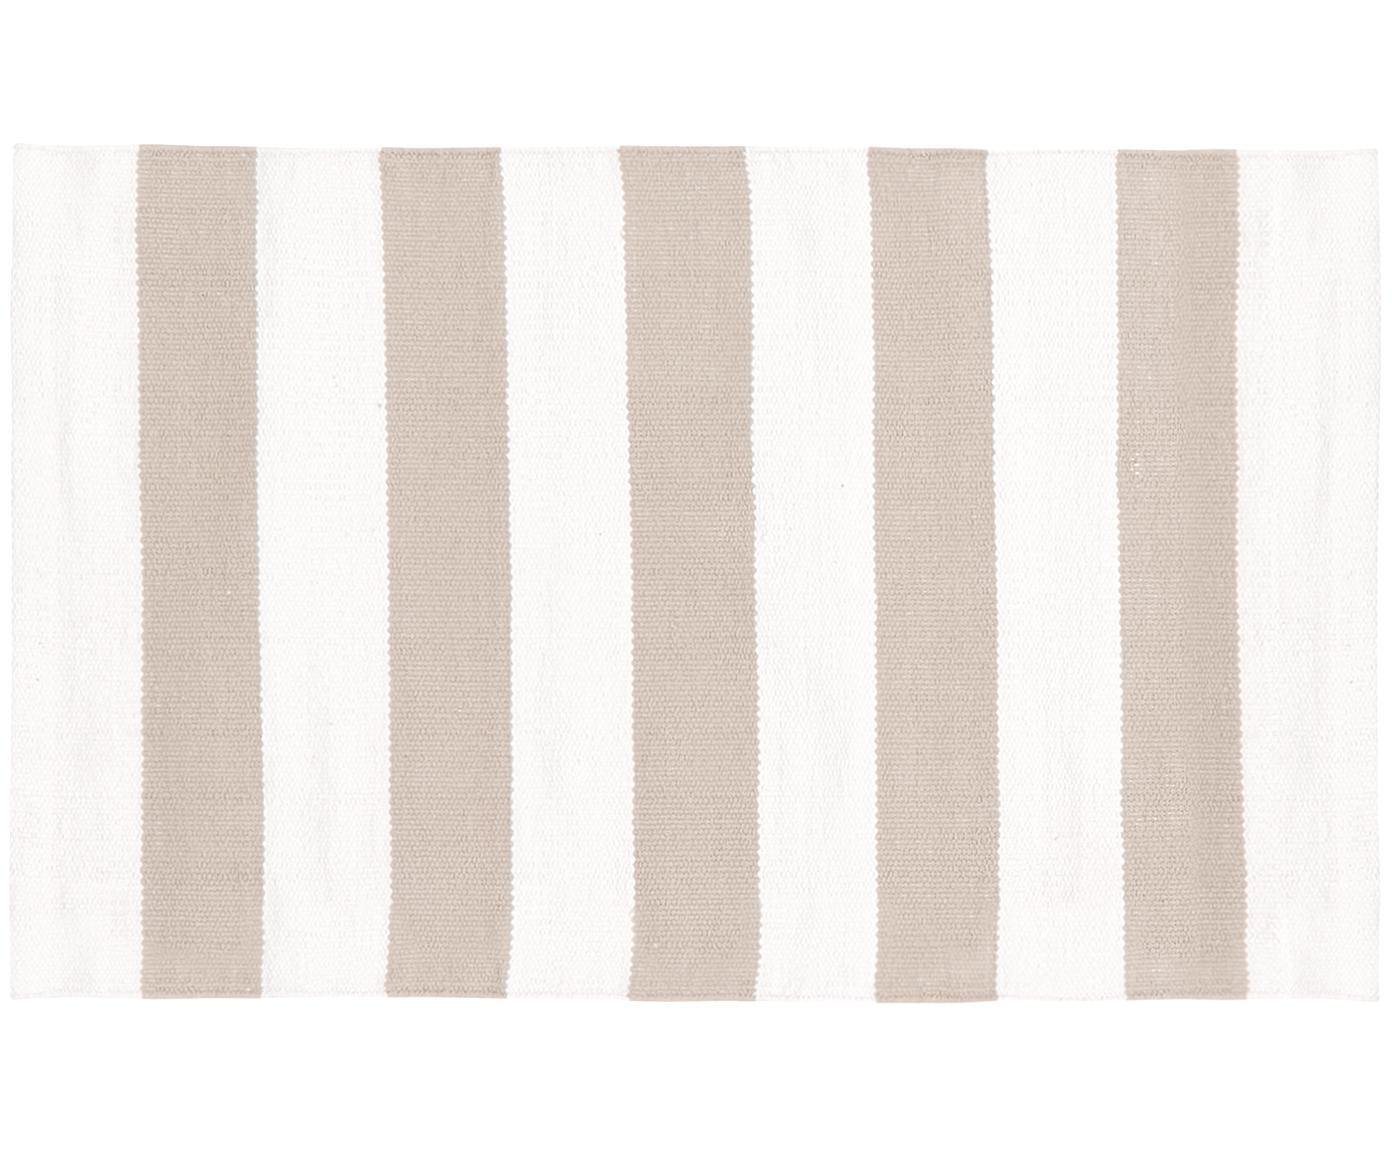 Alfombra artesanal de algodón Blocker, Algodón, Blanco crema, gris pardo, An 50 x L 80 cm (Tamaño XXS)